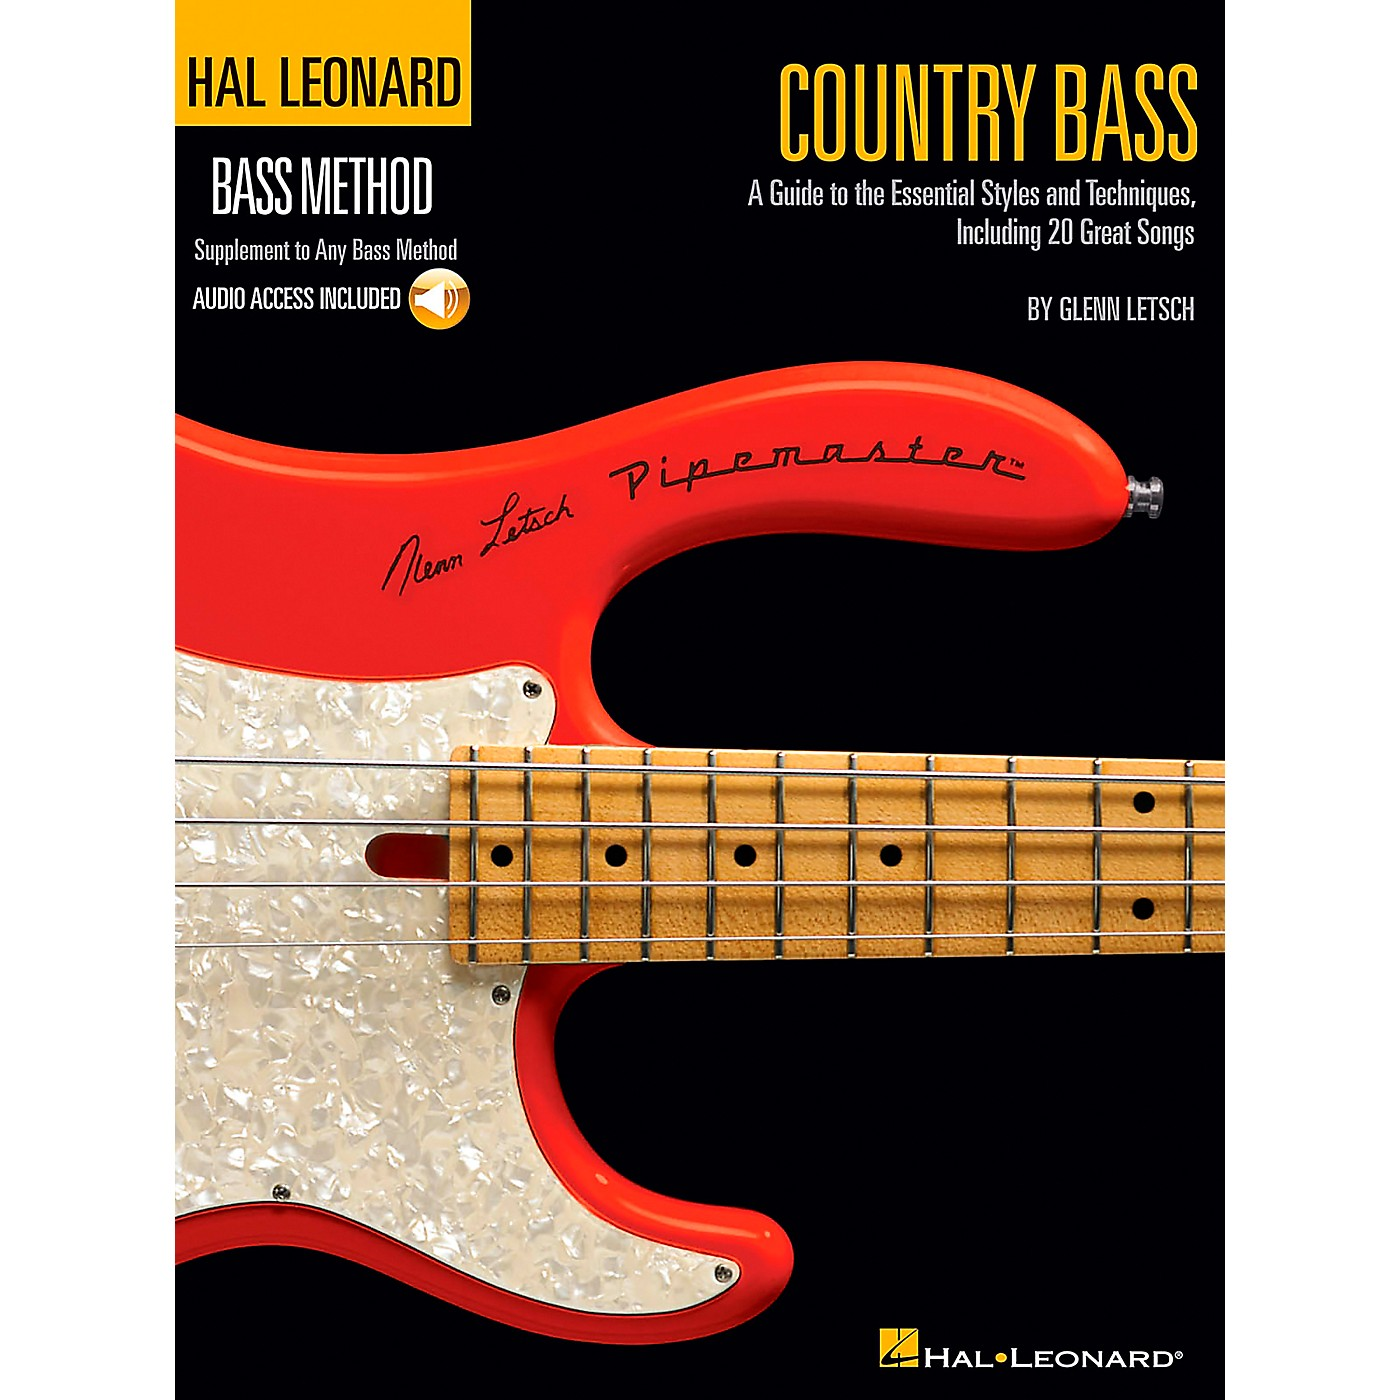 Hal Leonard Country Bass - Hal Leonard Bass Method Supplement To Any Bass Method Book/CD thumbnail